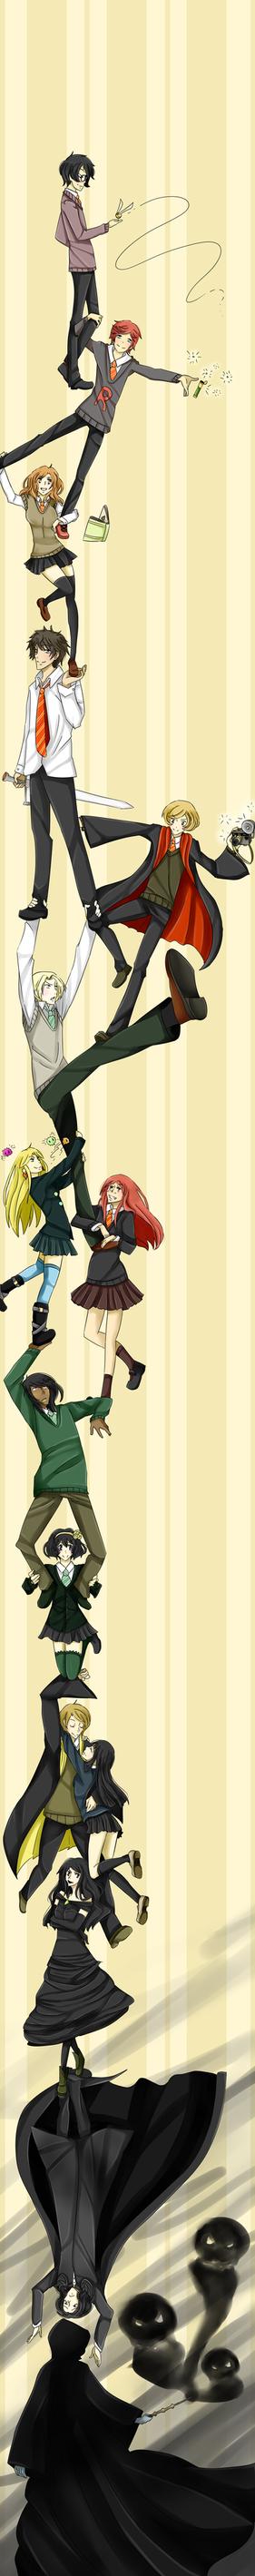 DRRR parody: Harry Potter by iondra